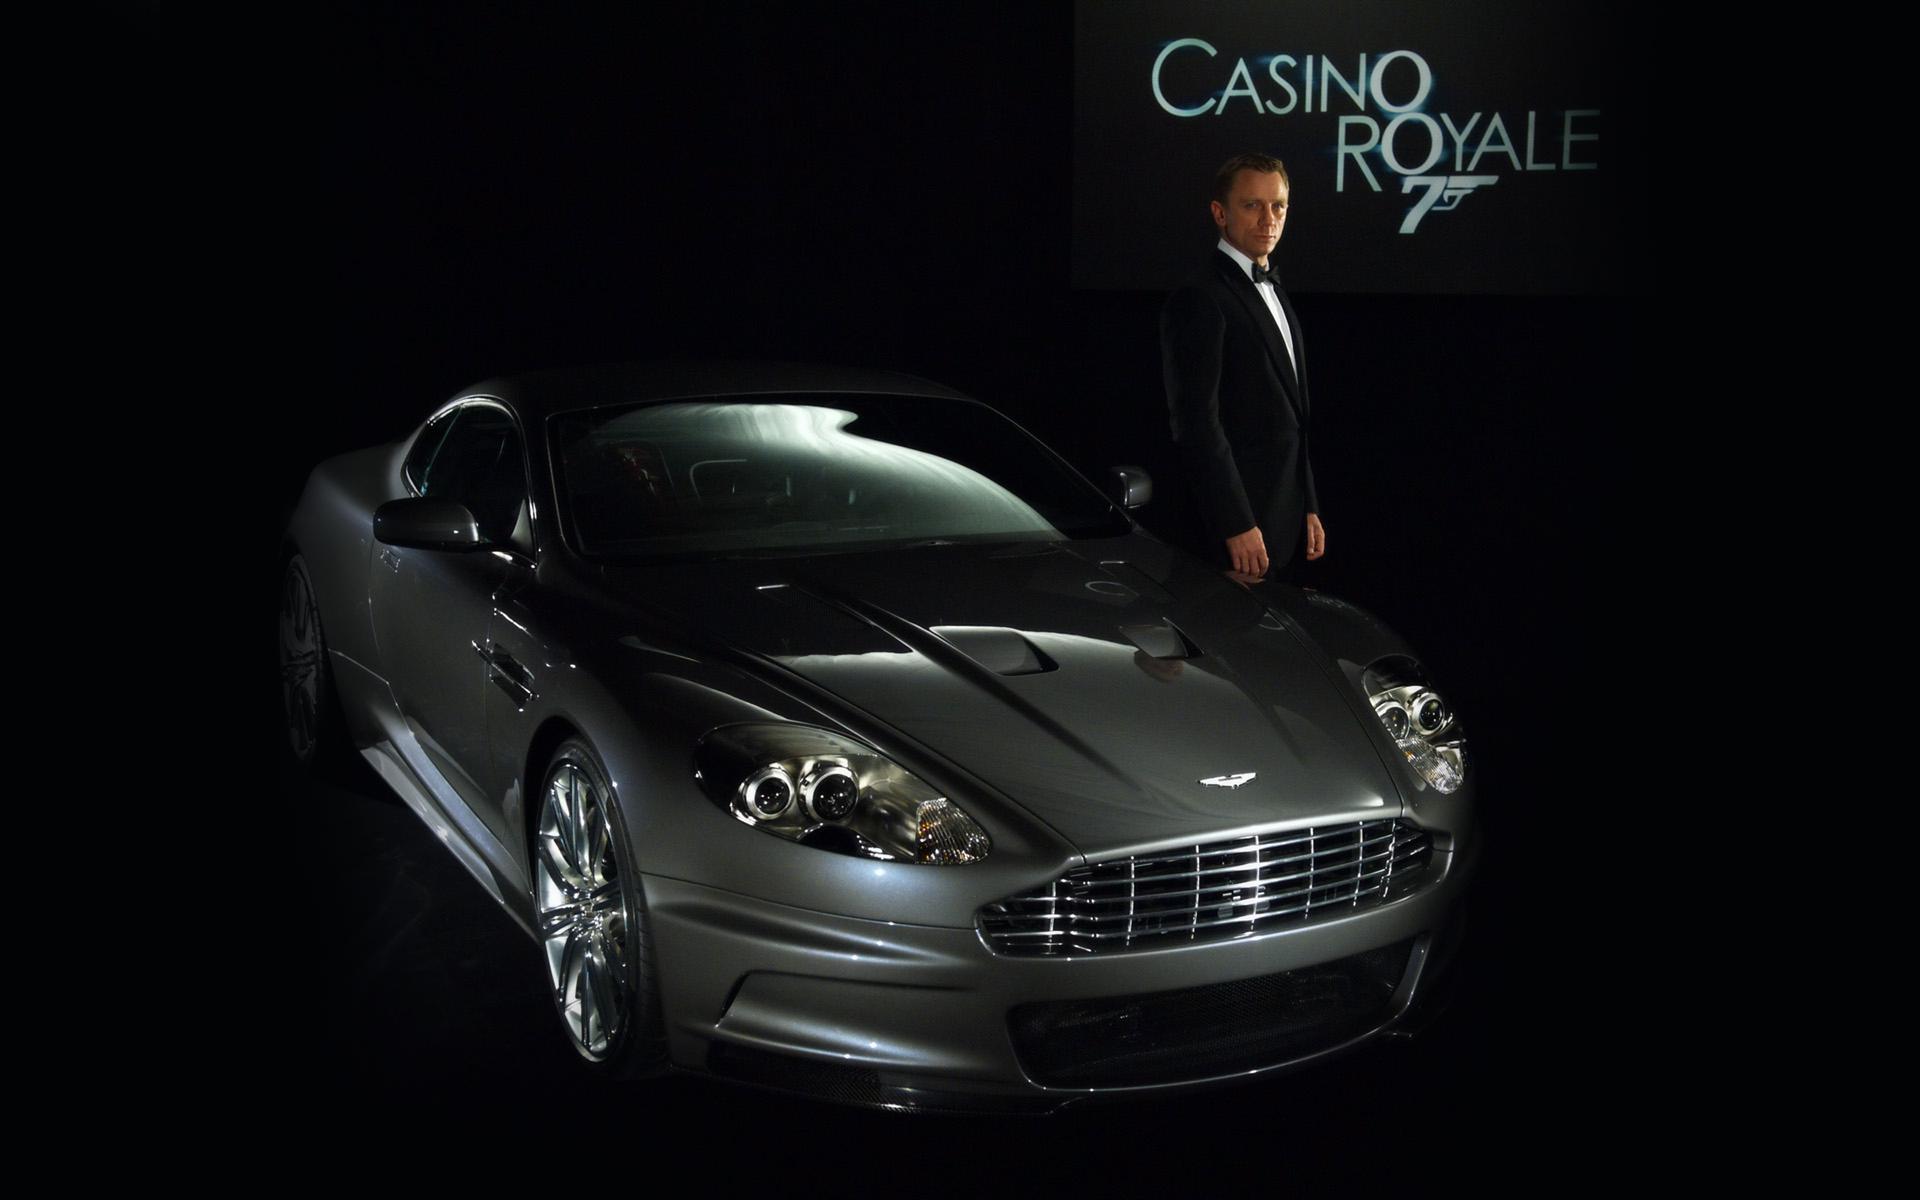 Carly Craig cars Aston Martin James Bond Casino Royale vehicles 1920x1200